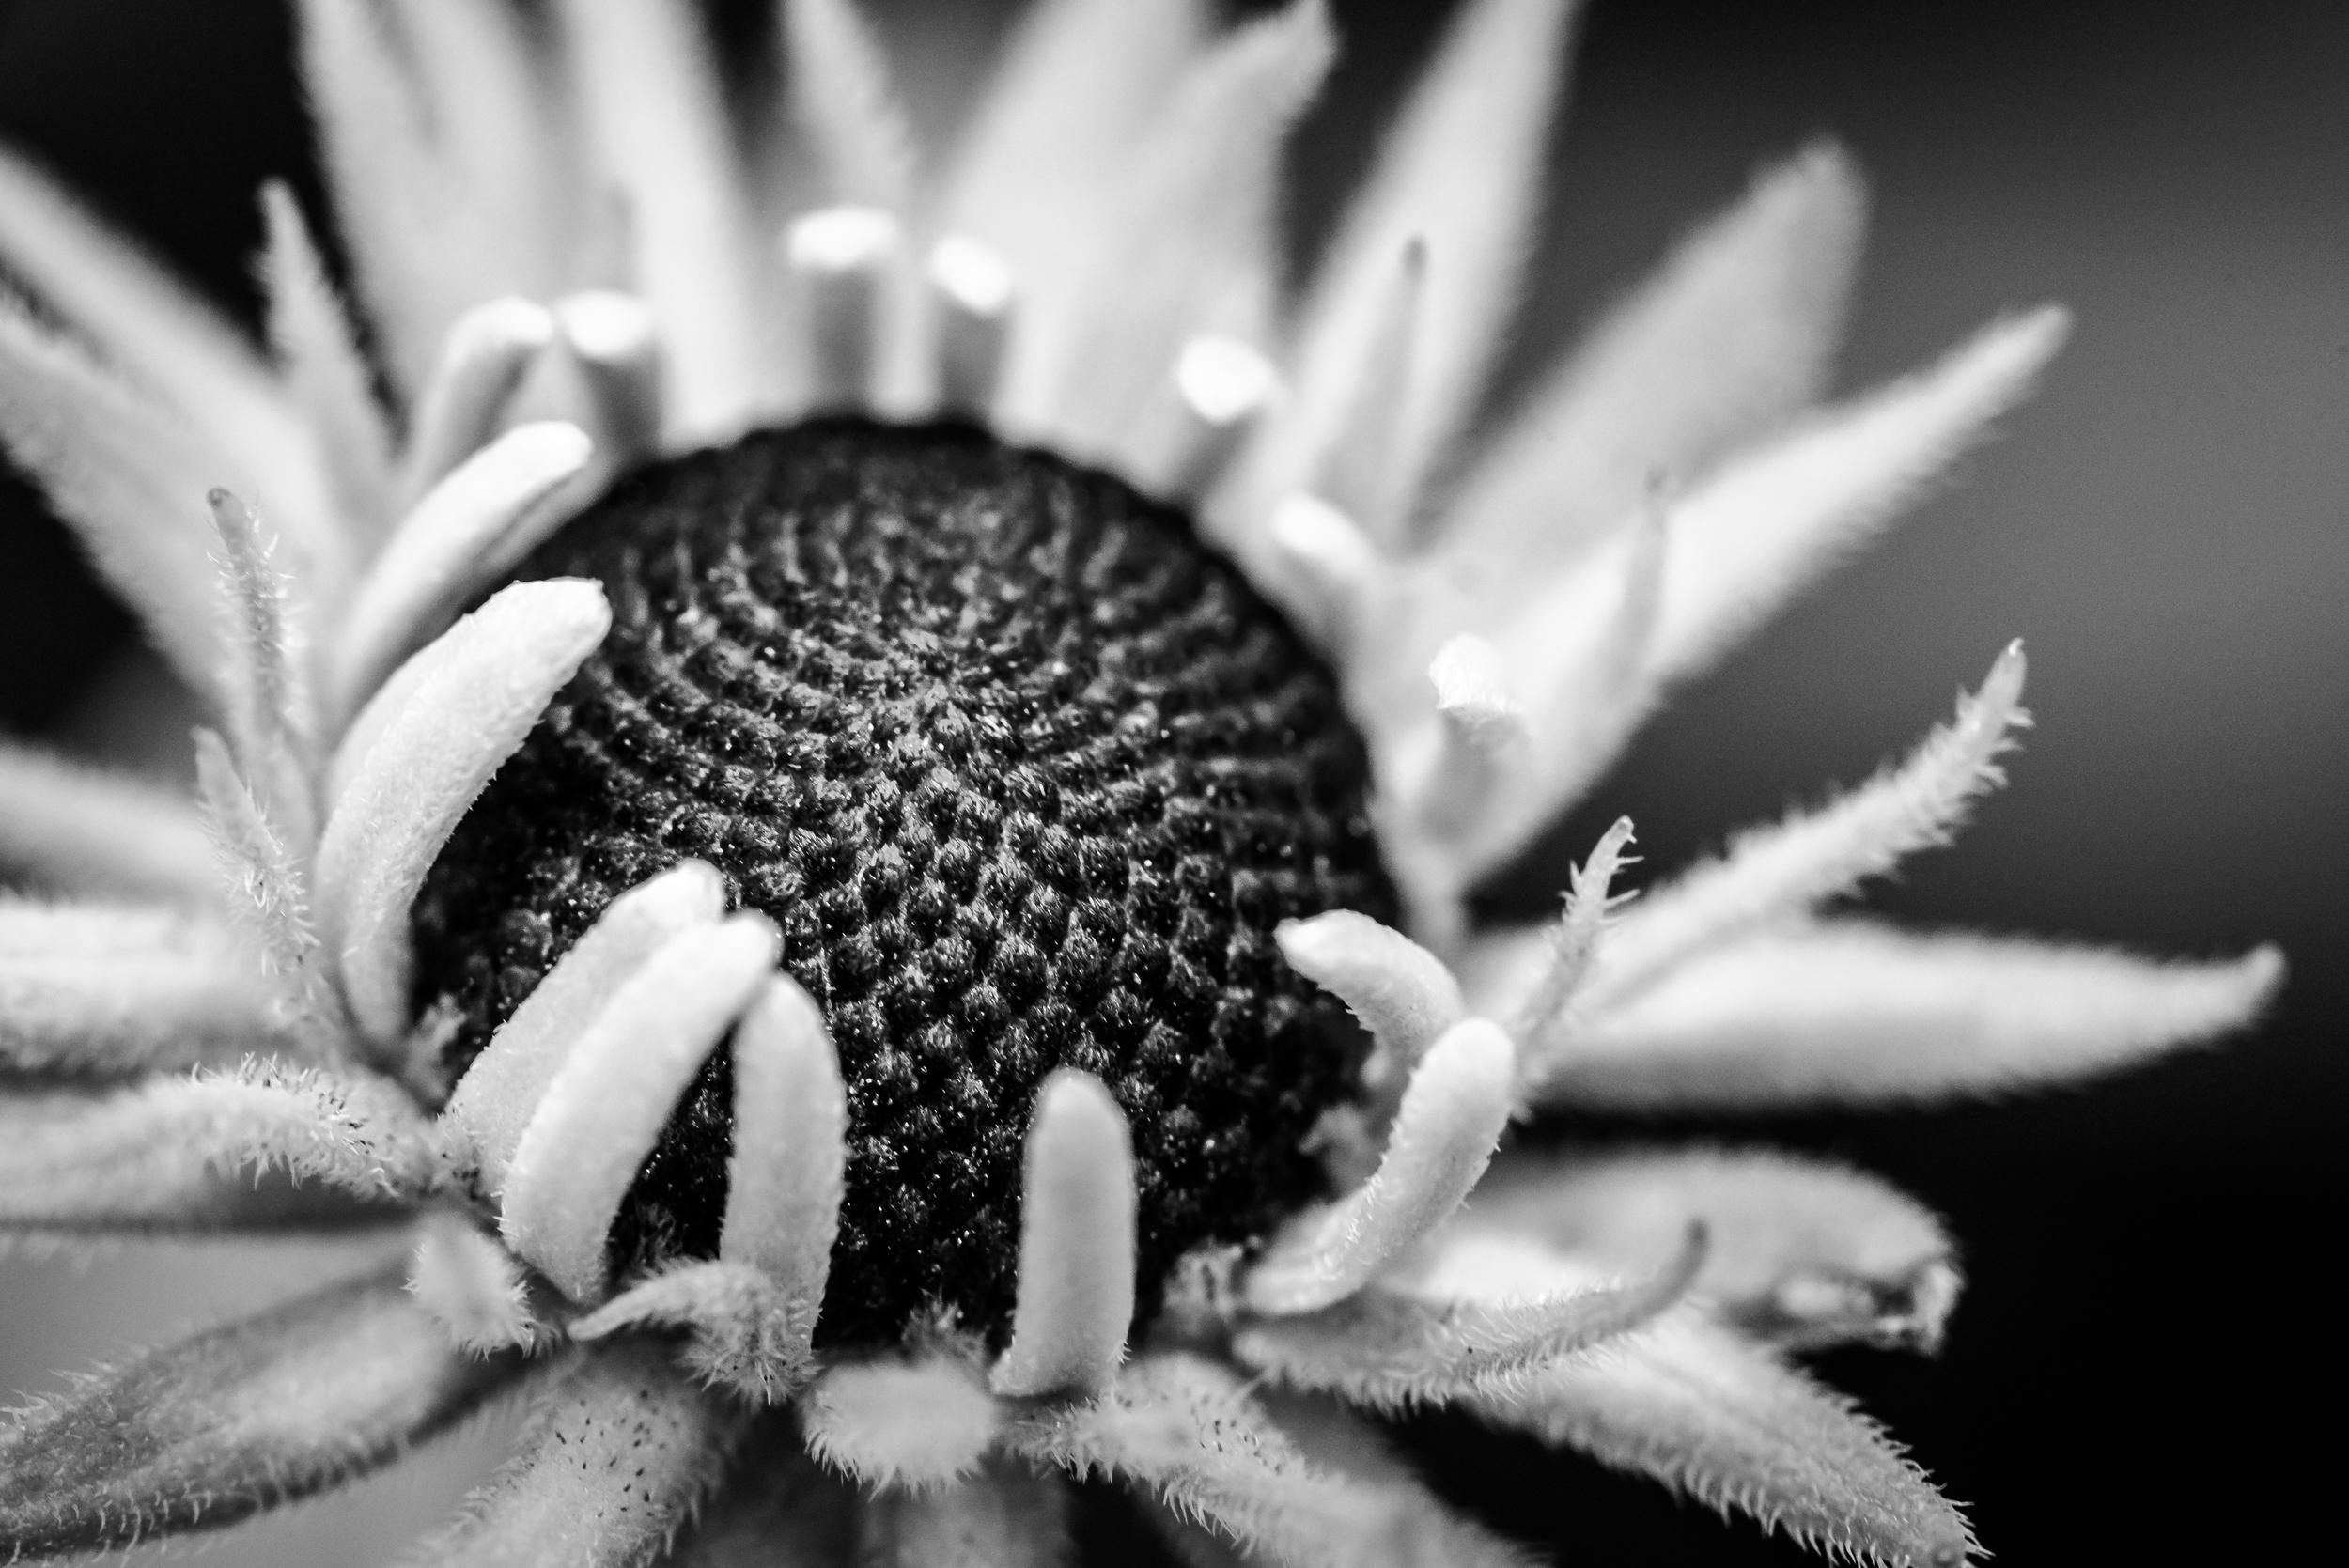 Jeremy Mudd - Yet to Bloom